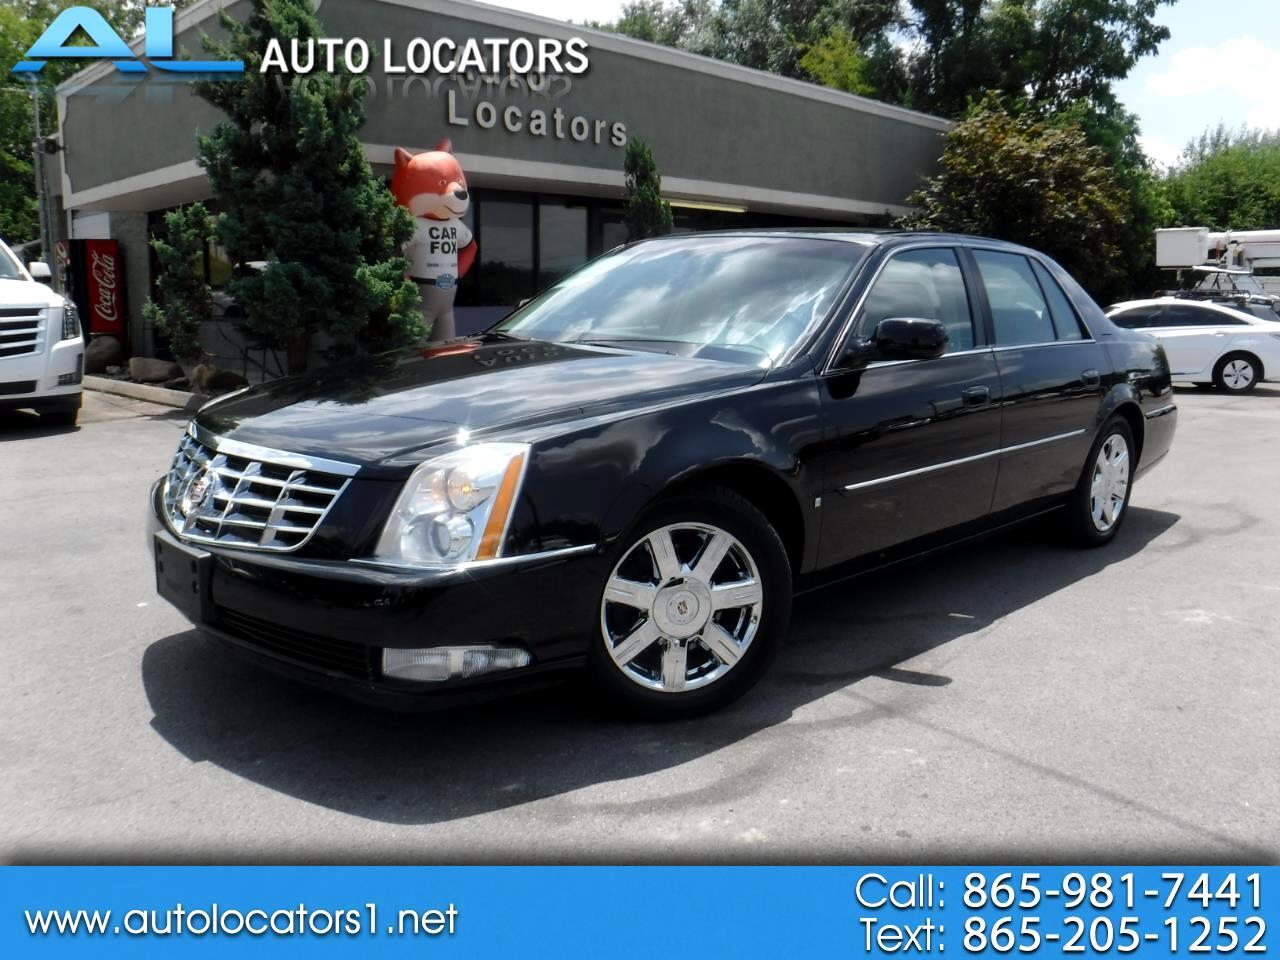 2007 Cadillac DTS 4dr Sdn Luxury I